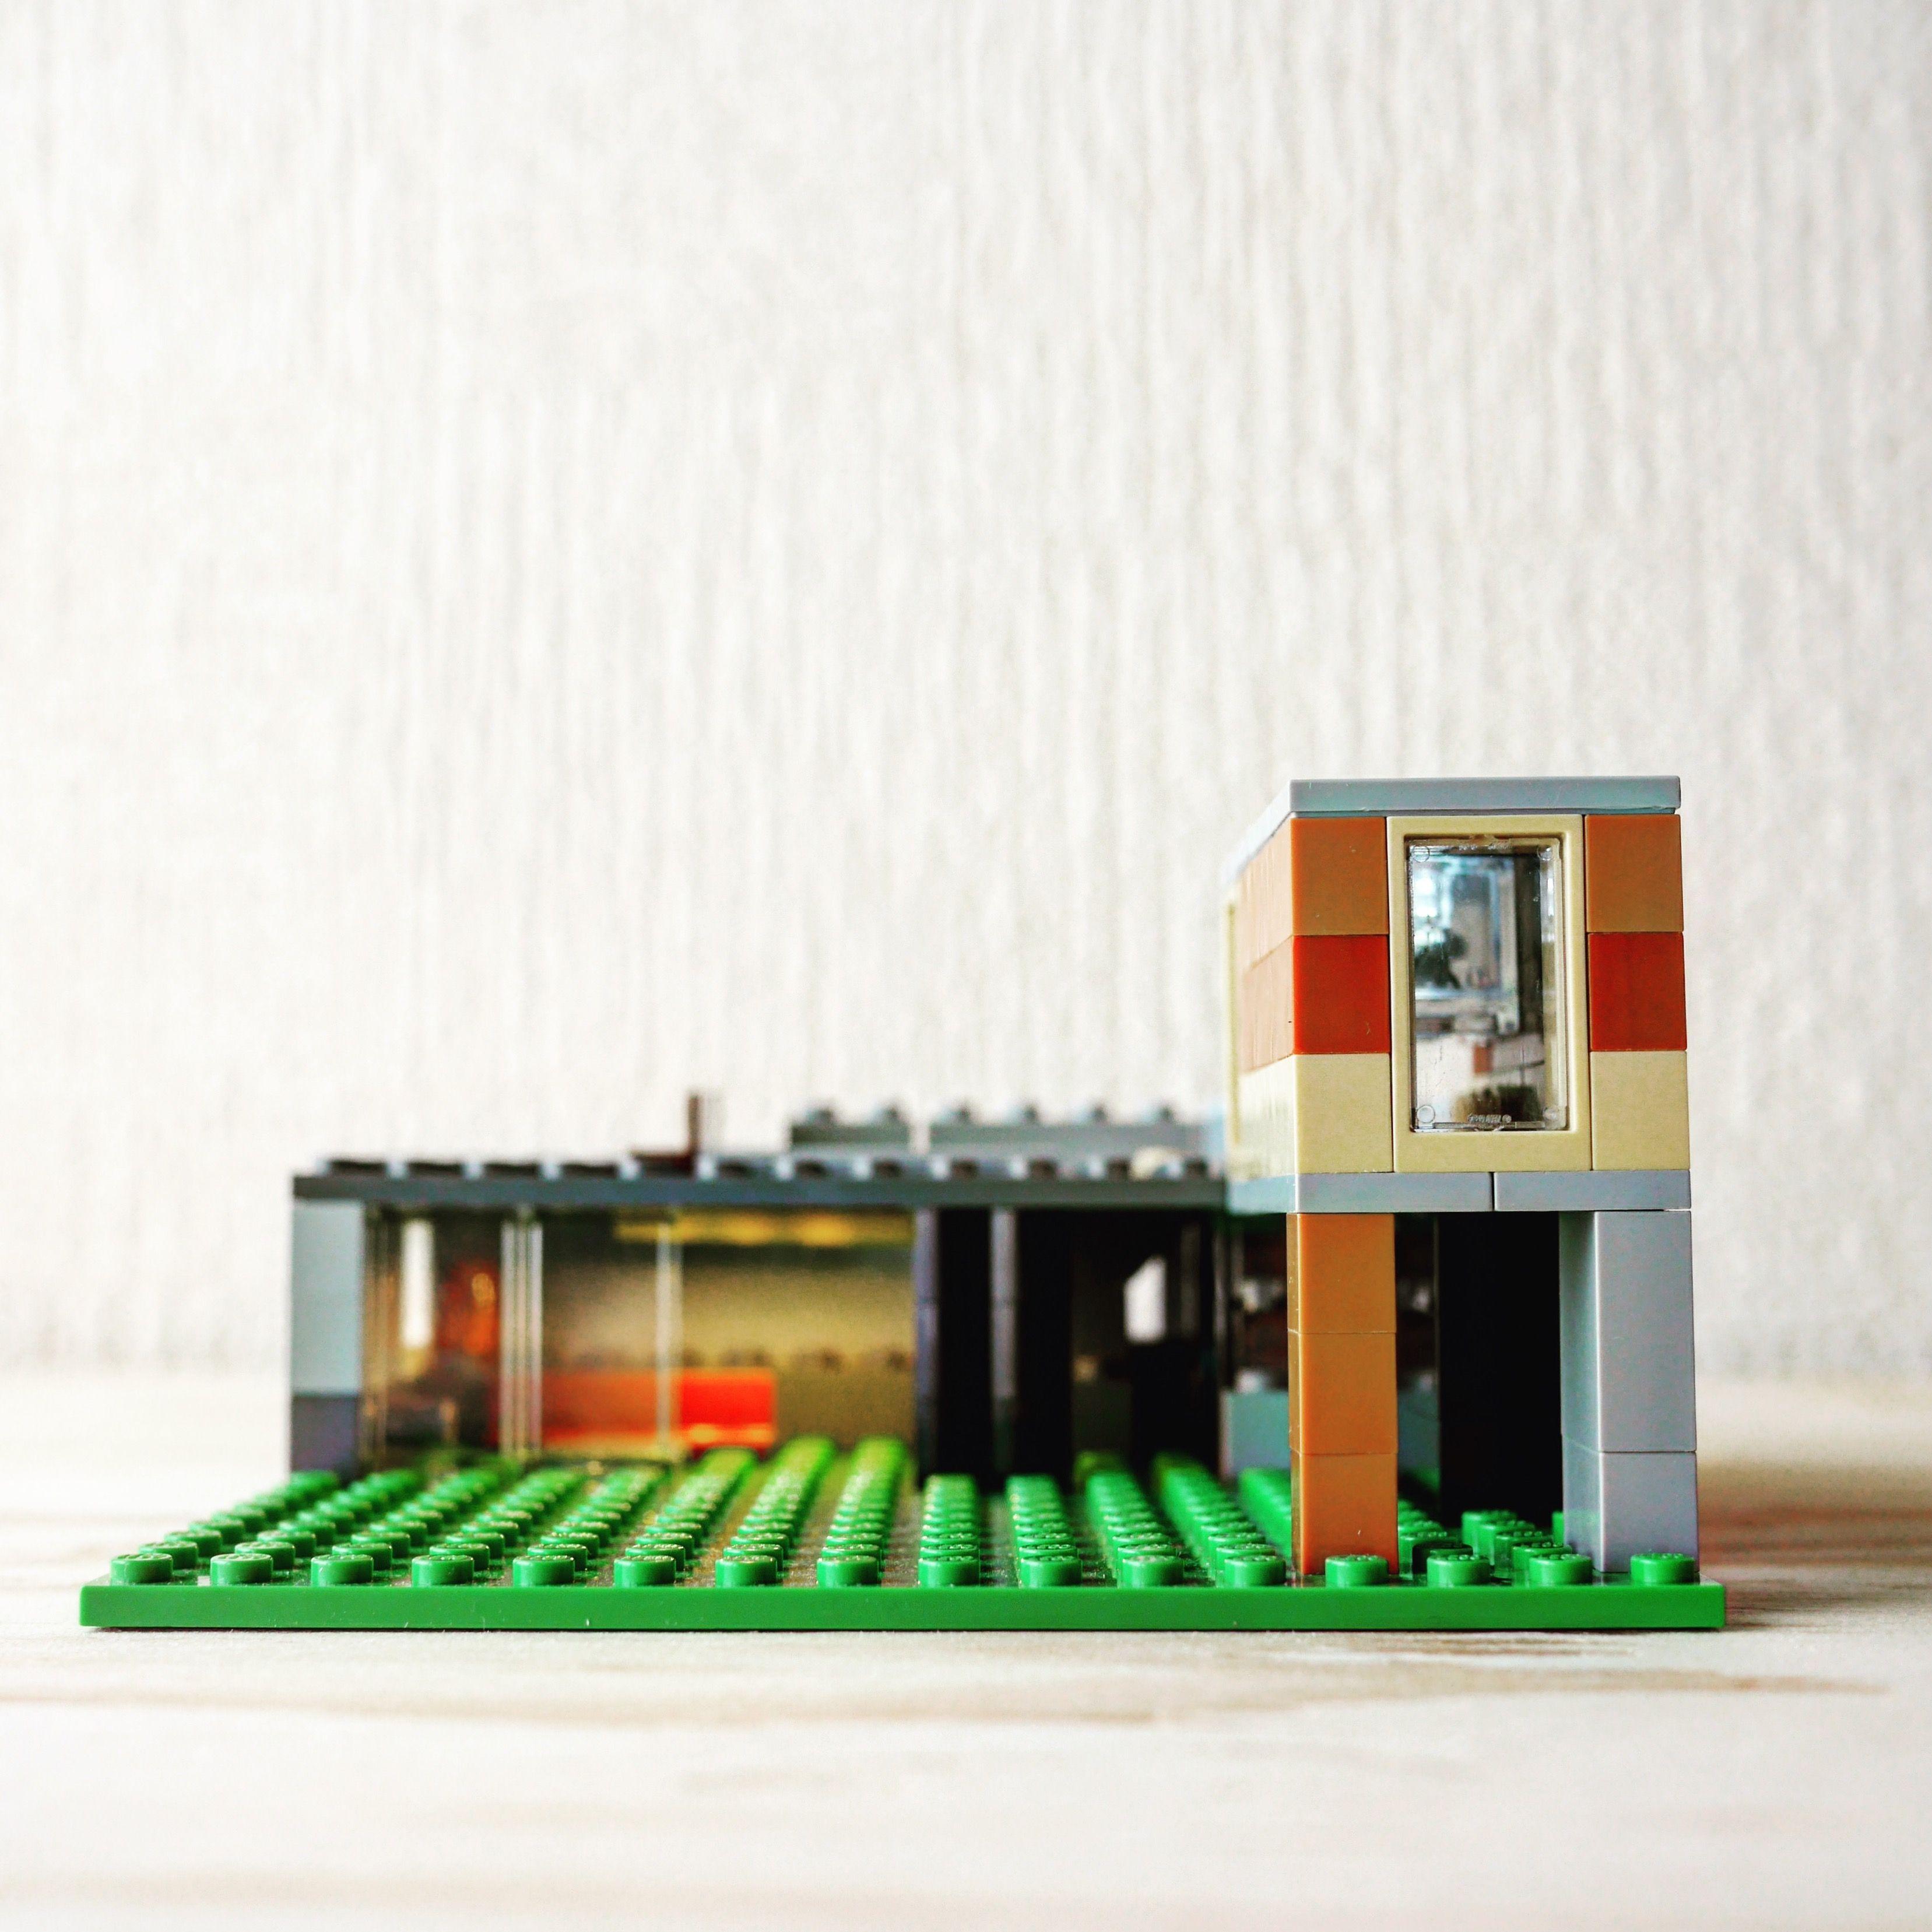 Building Instruction Lego House In 2020 Classic Lego Lego House